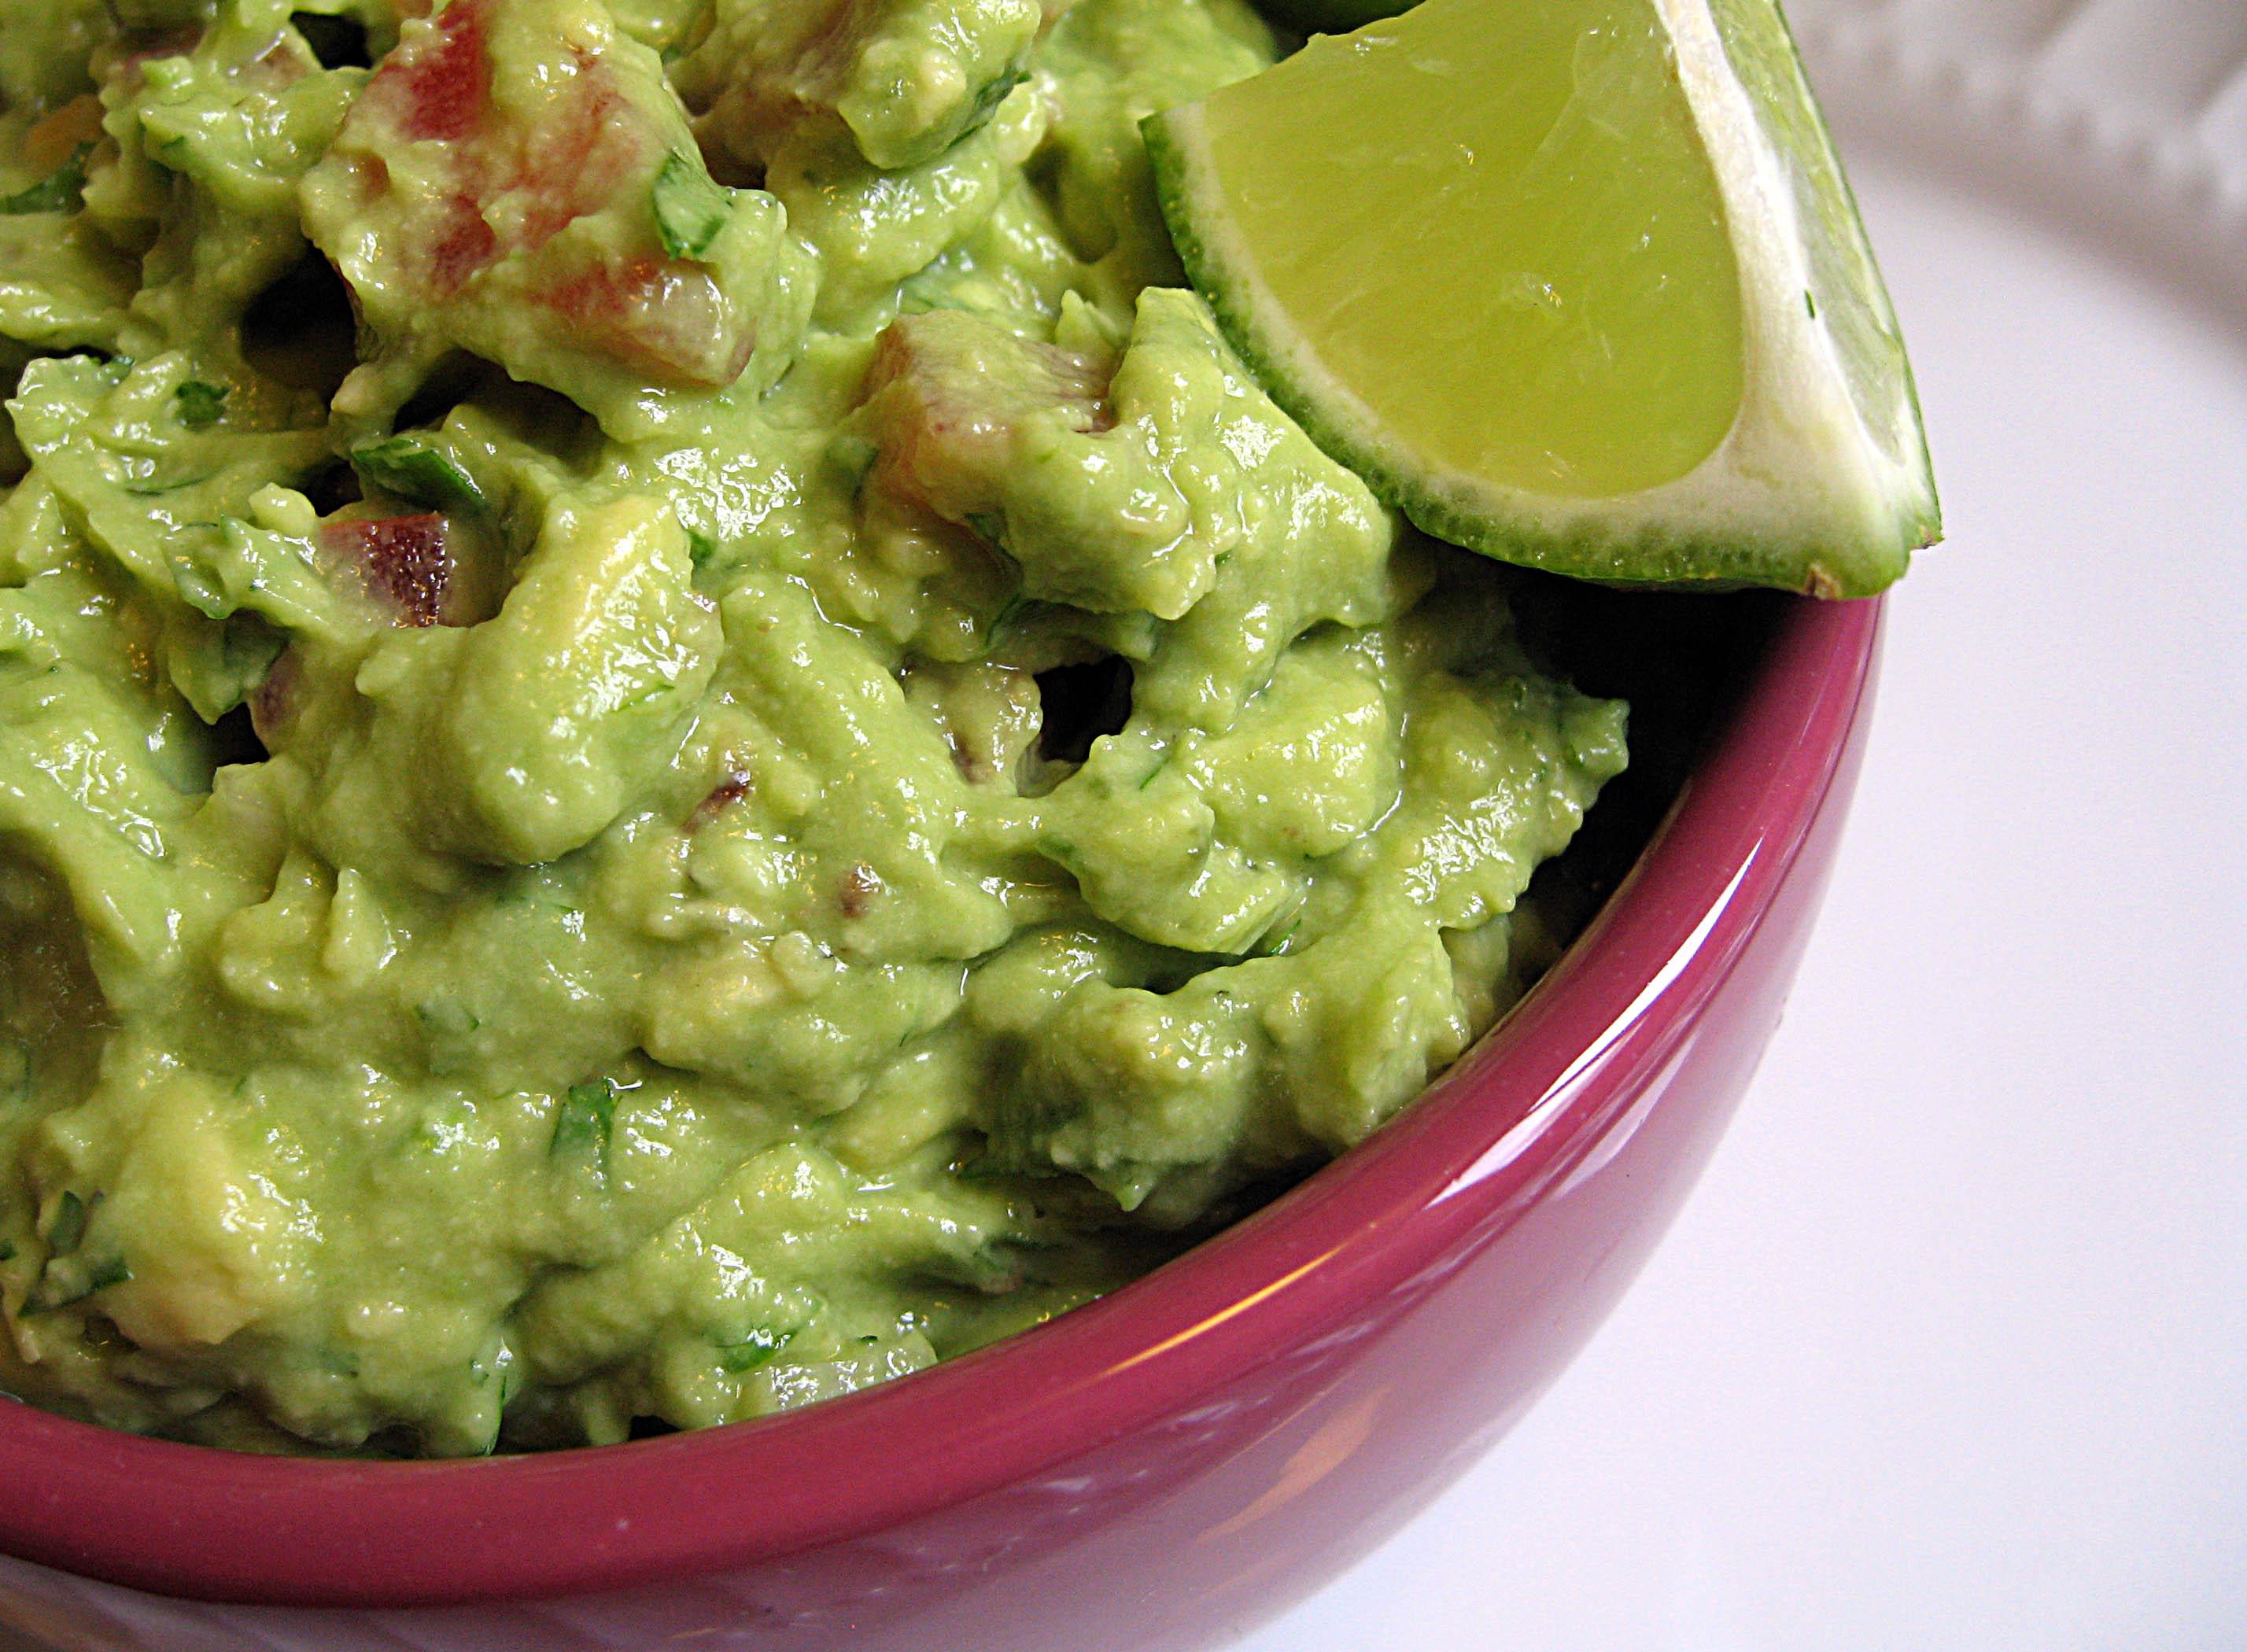 guacamole.jpg R